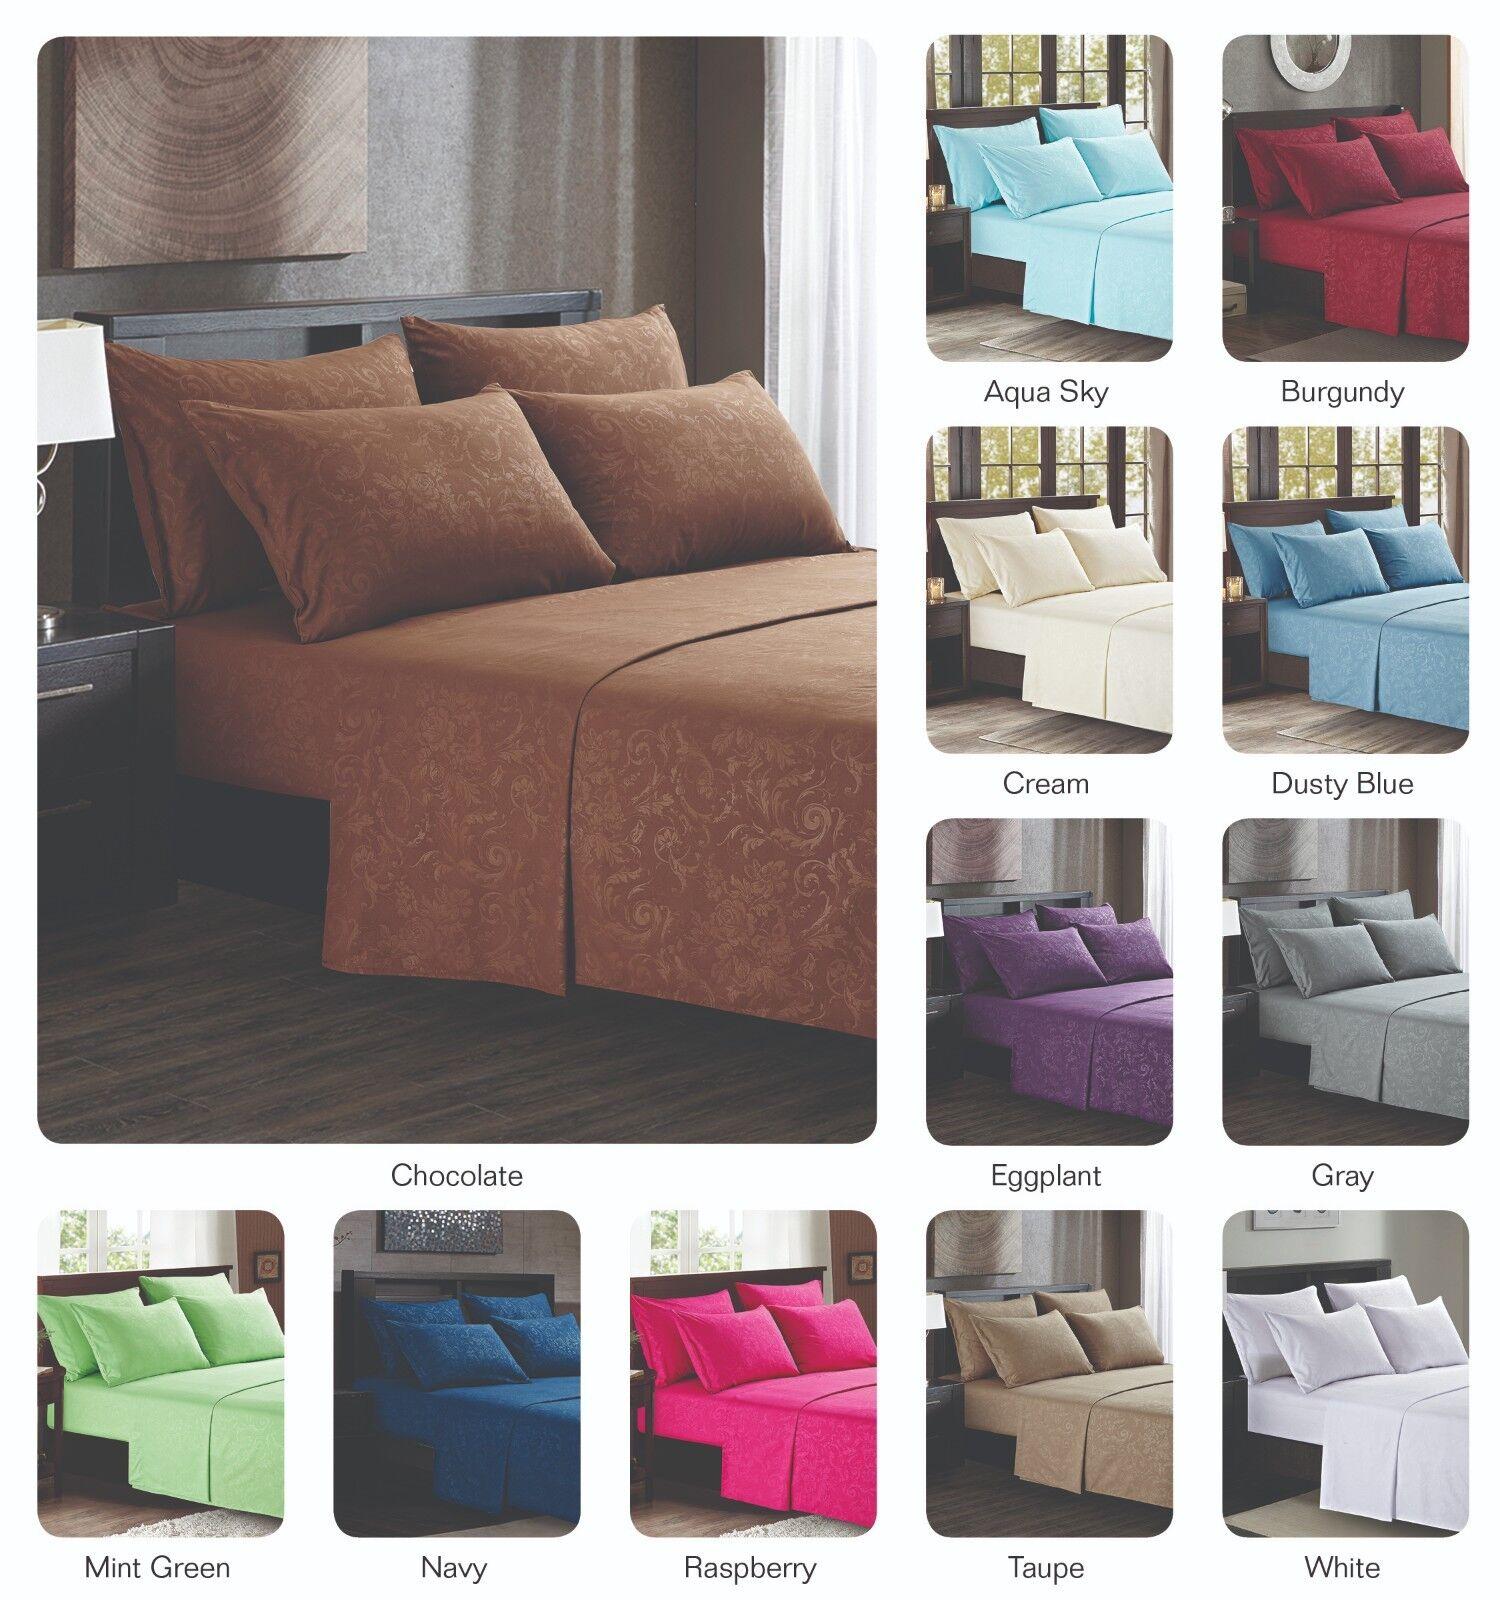 Platinum Hotel Quality Embossed Queen Sheet Set w 4 Pillow Cases Navy bluee Dark